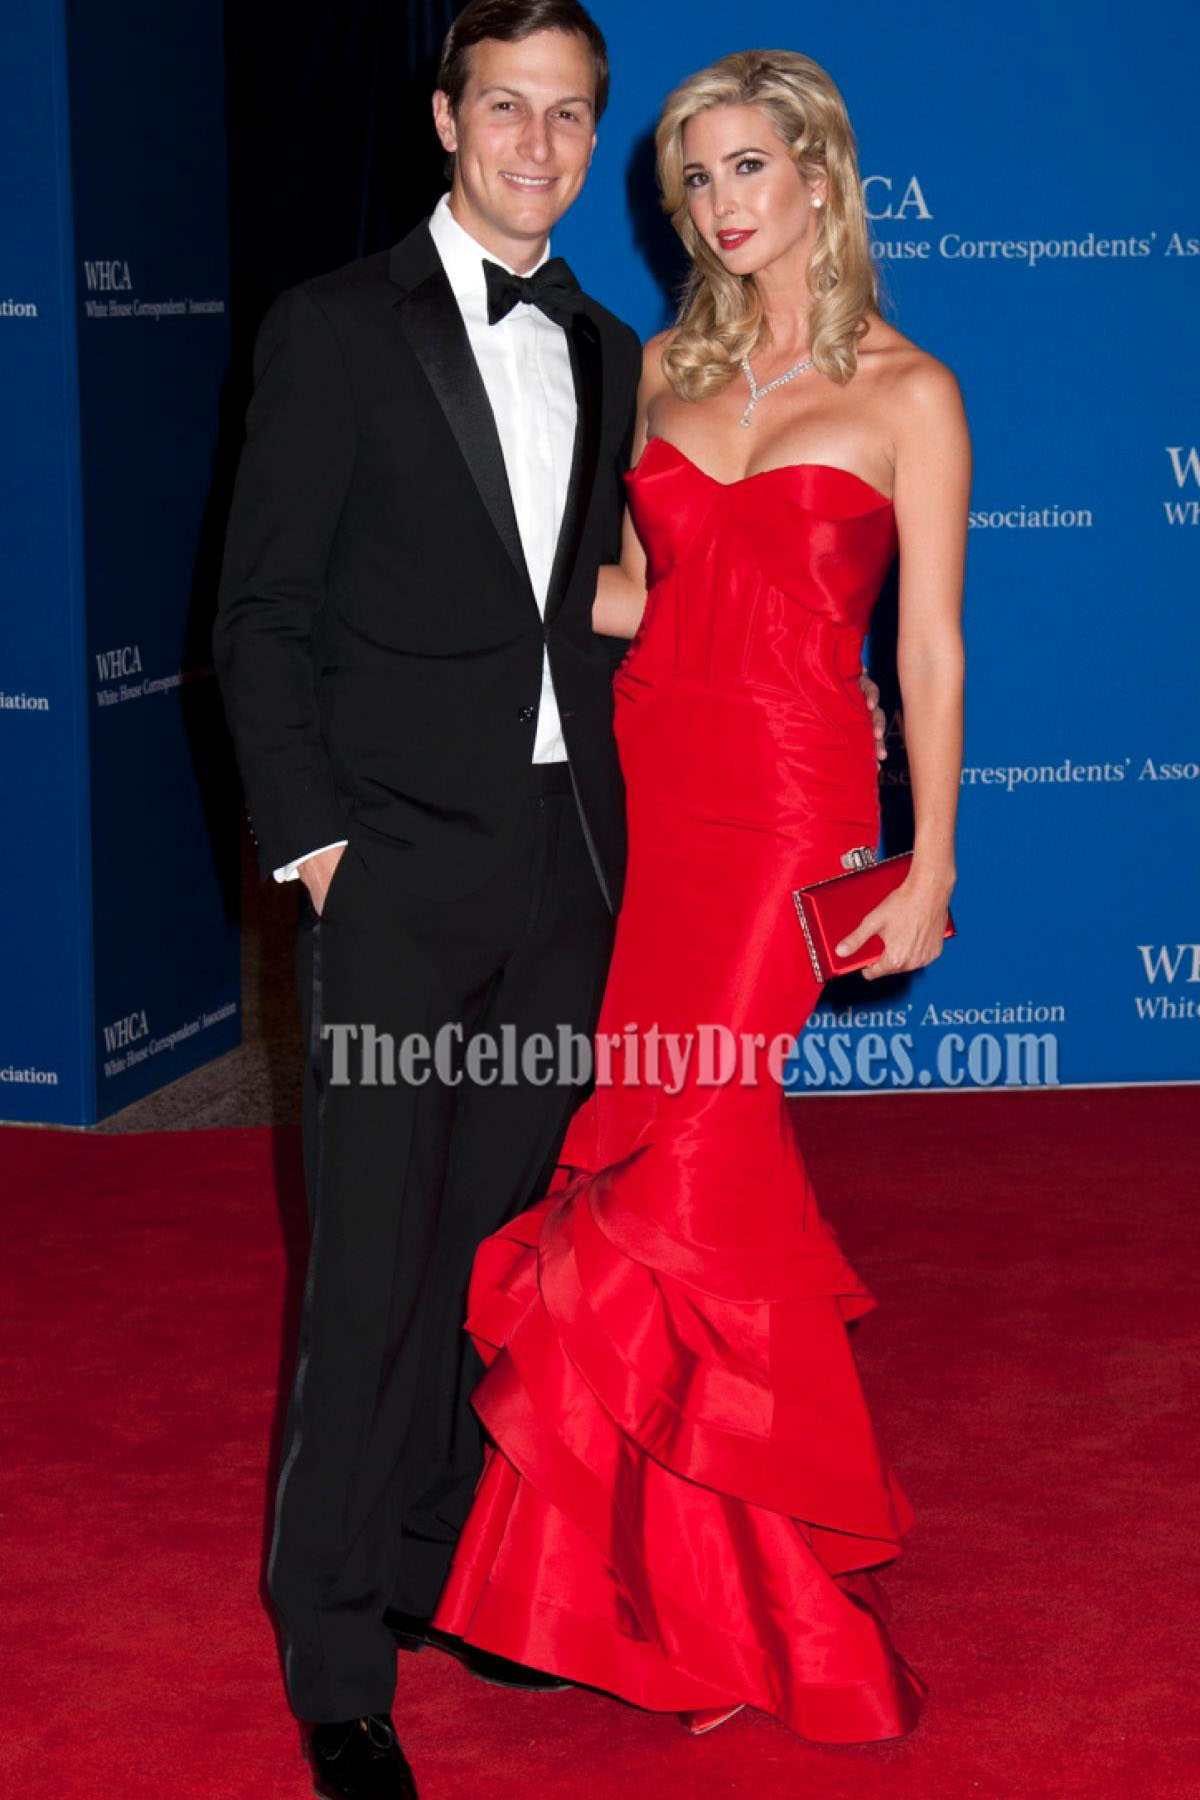 6ad20869827 Ivanka Trump Red Mermaid Formal Dress 2015 White House Correspondents   Association Dinner - TheCelebrityDresses